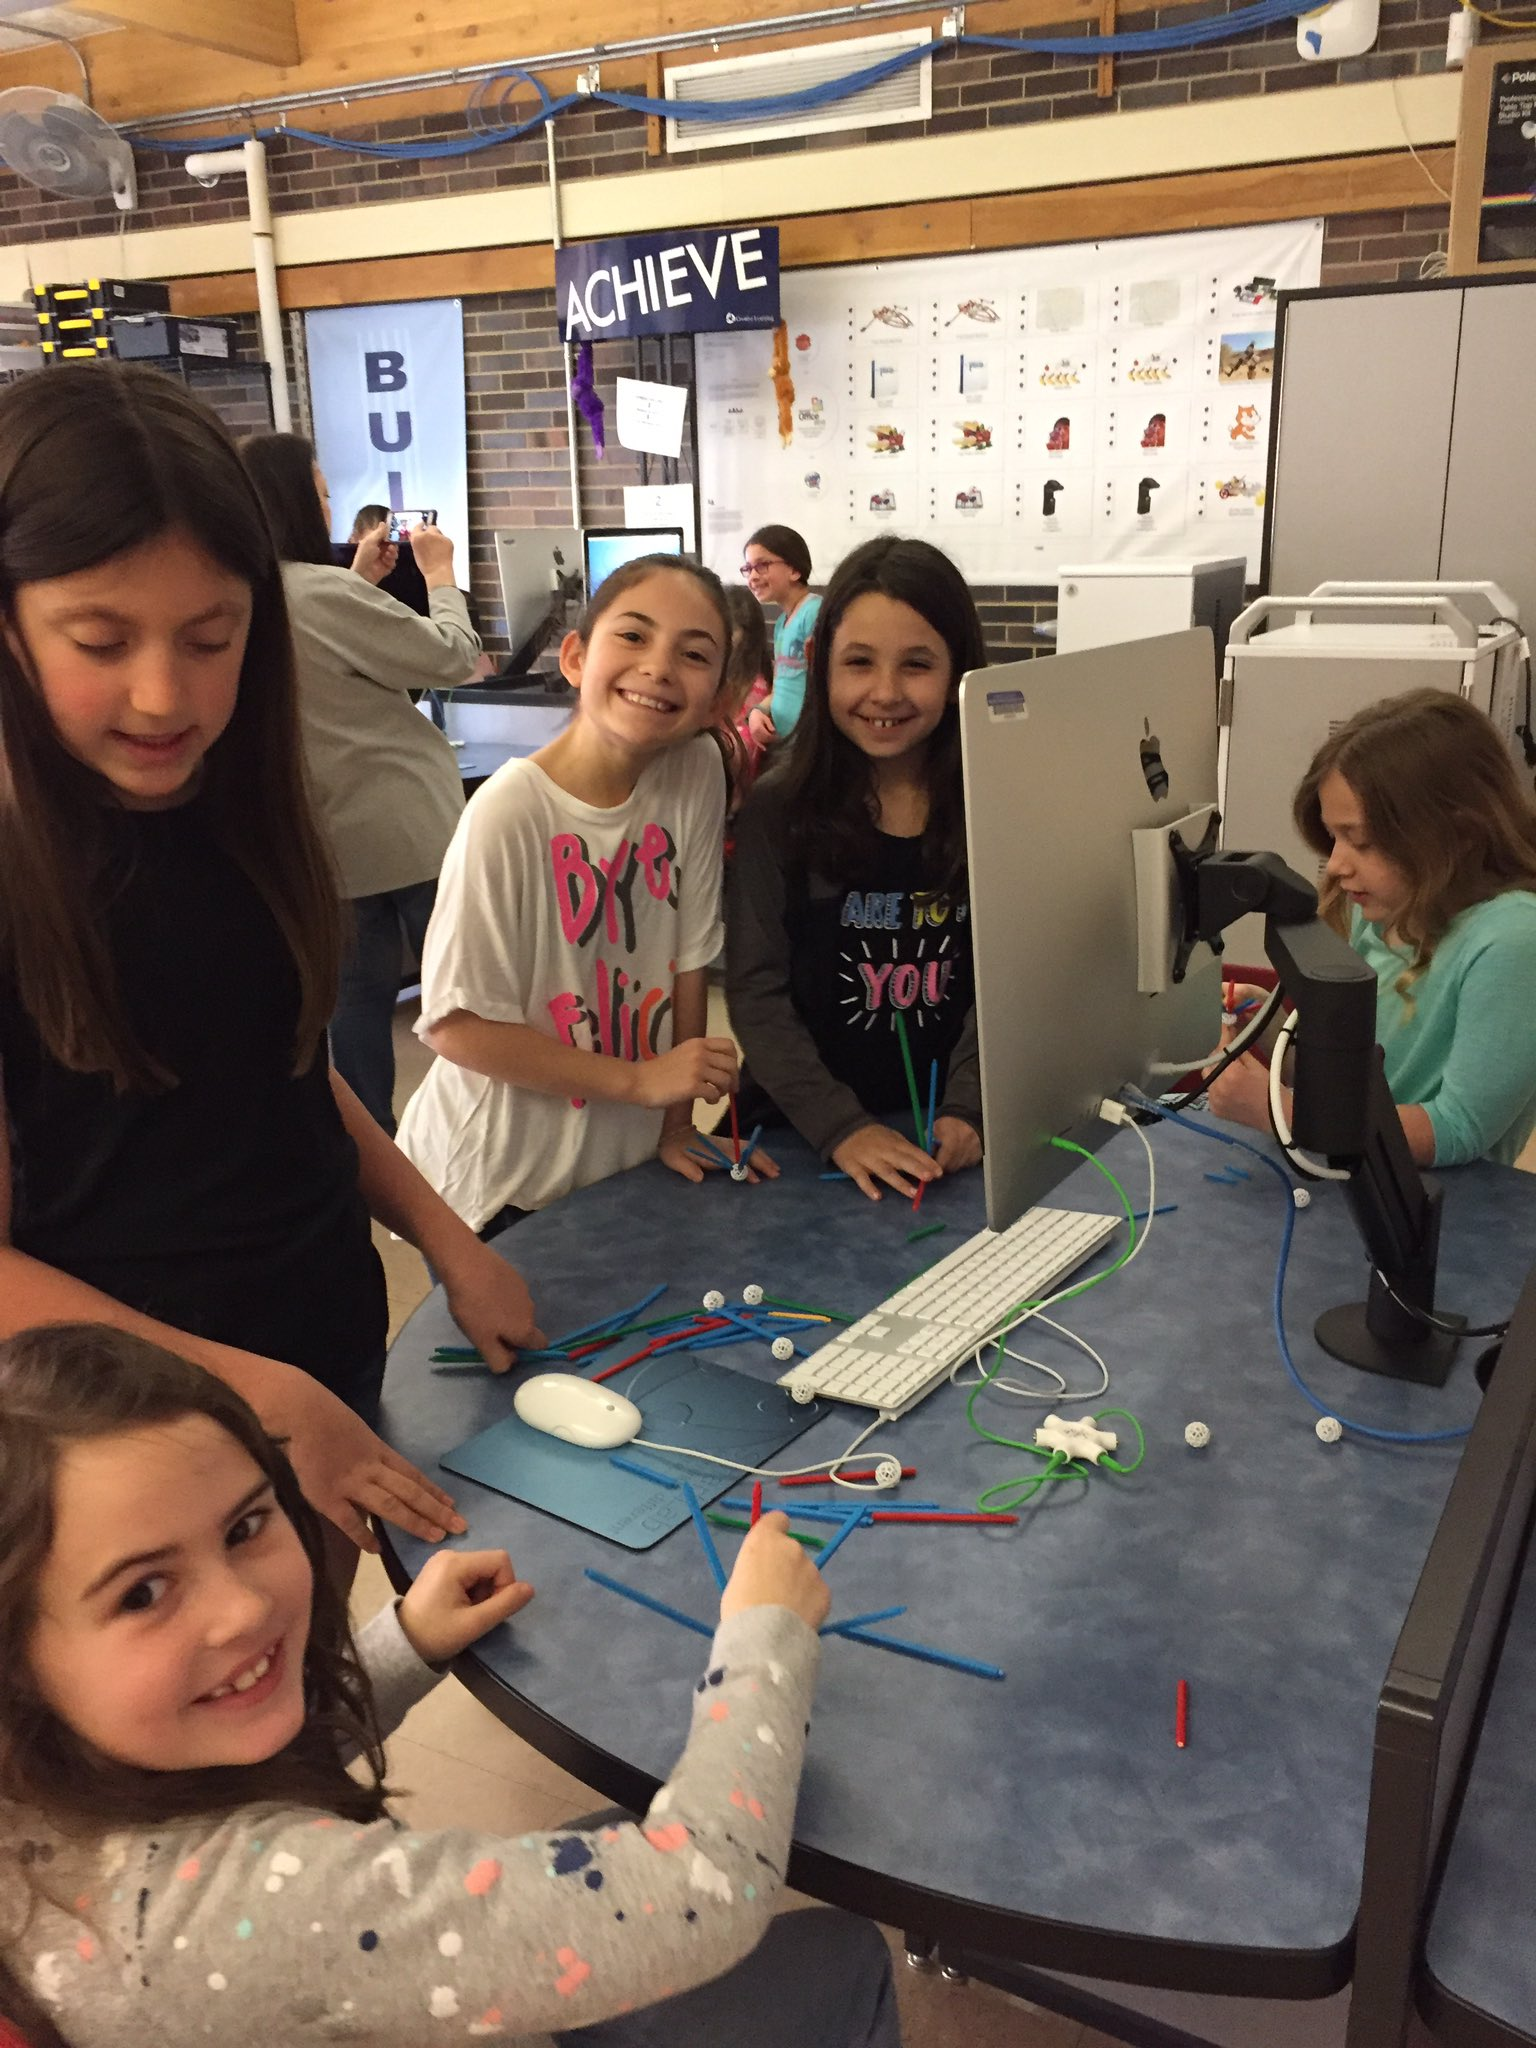 First grade/fourth grade buddy stem lab #engage109 #sp109 https://t.co/bIwp8rXhJG